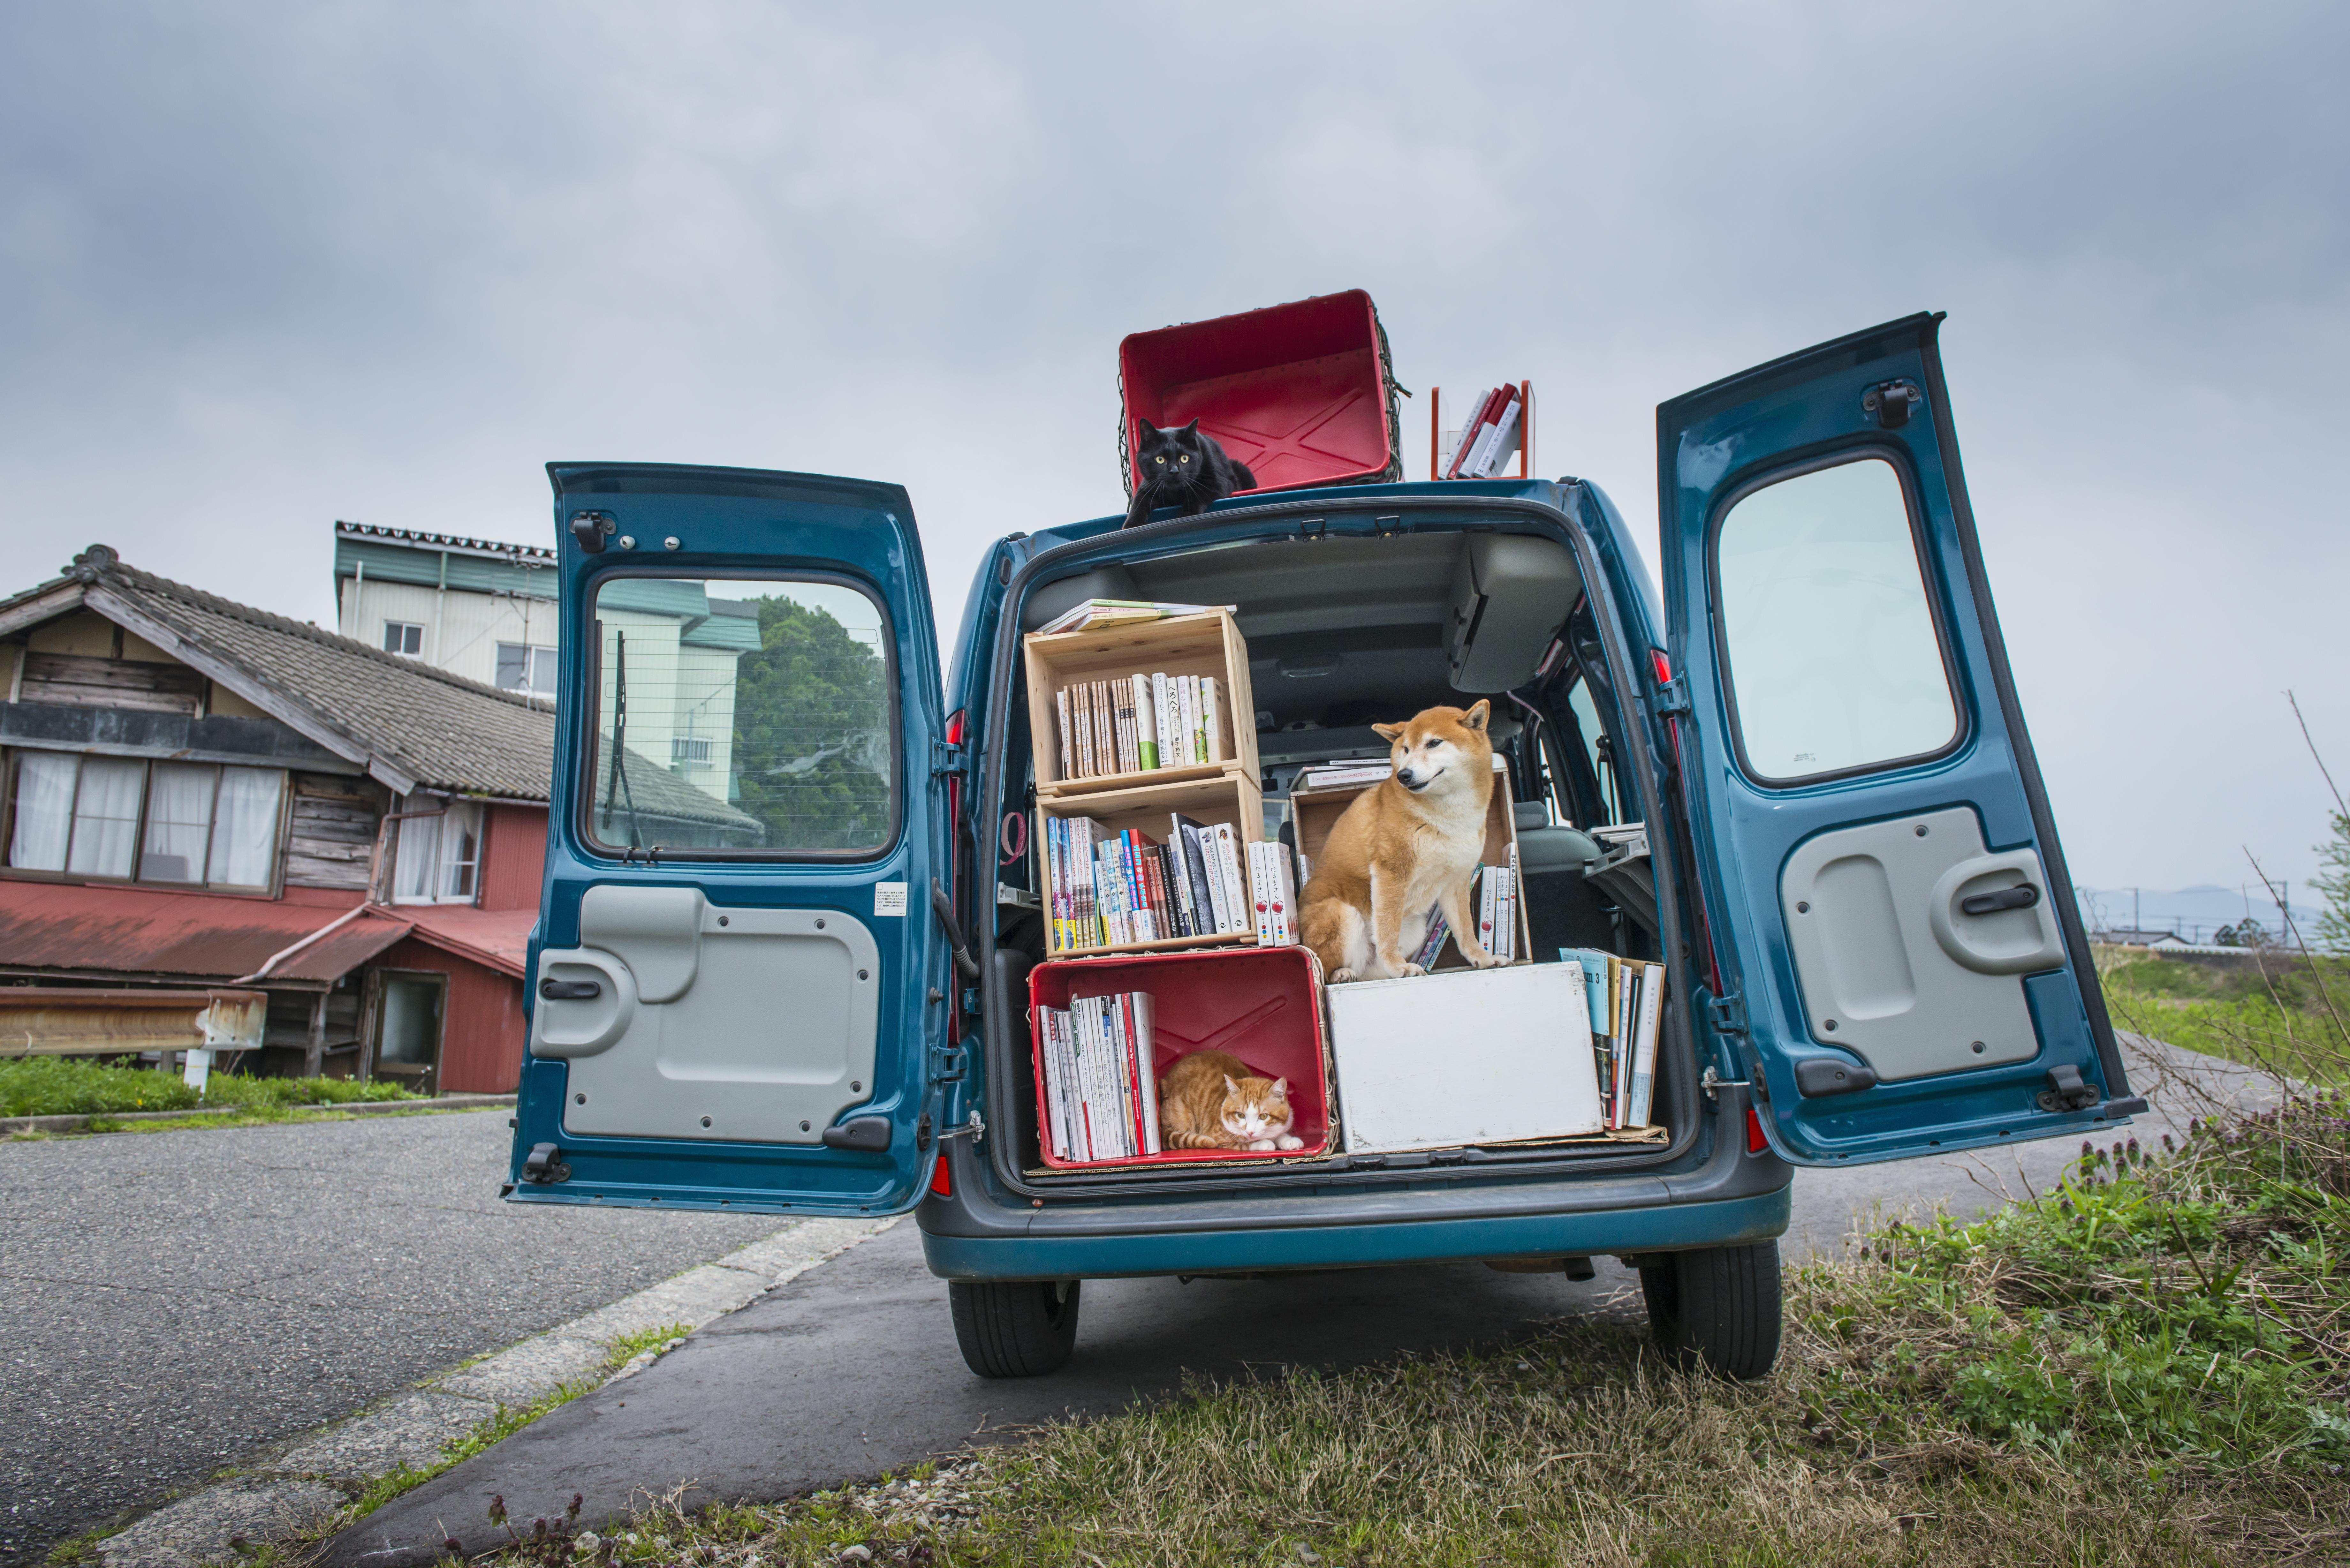 A moving Bookstore